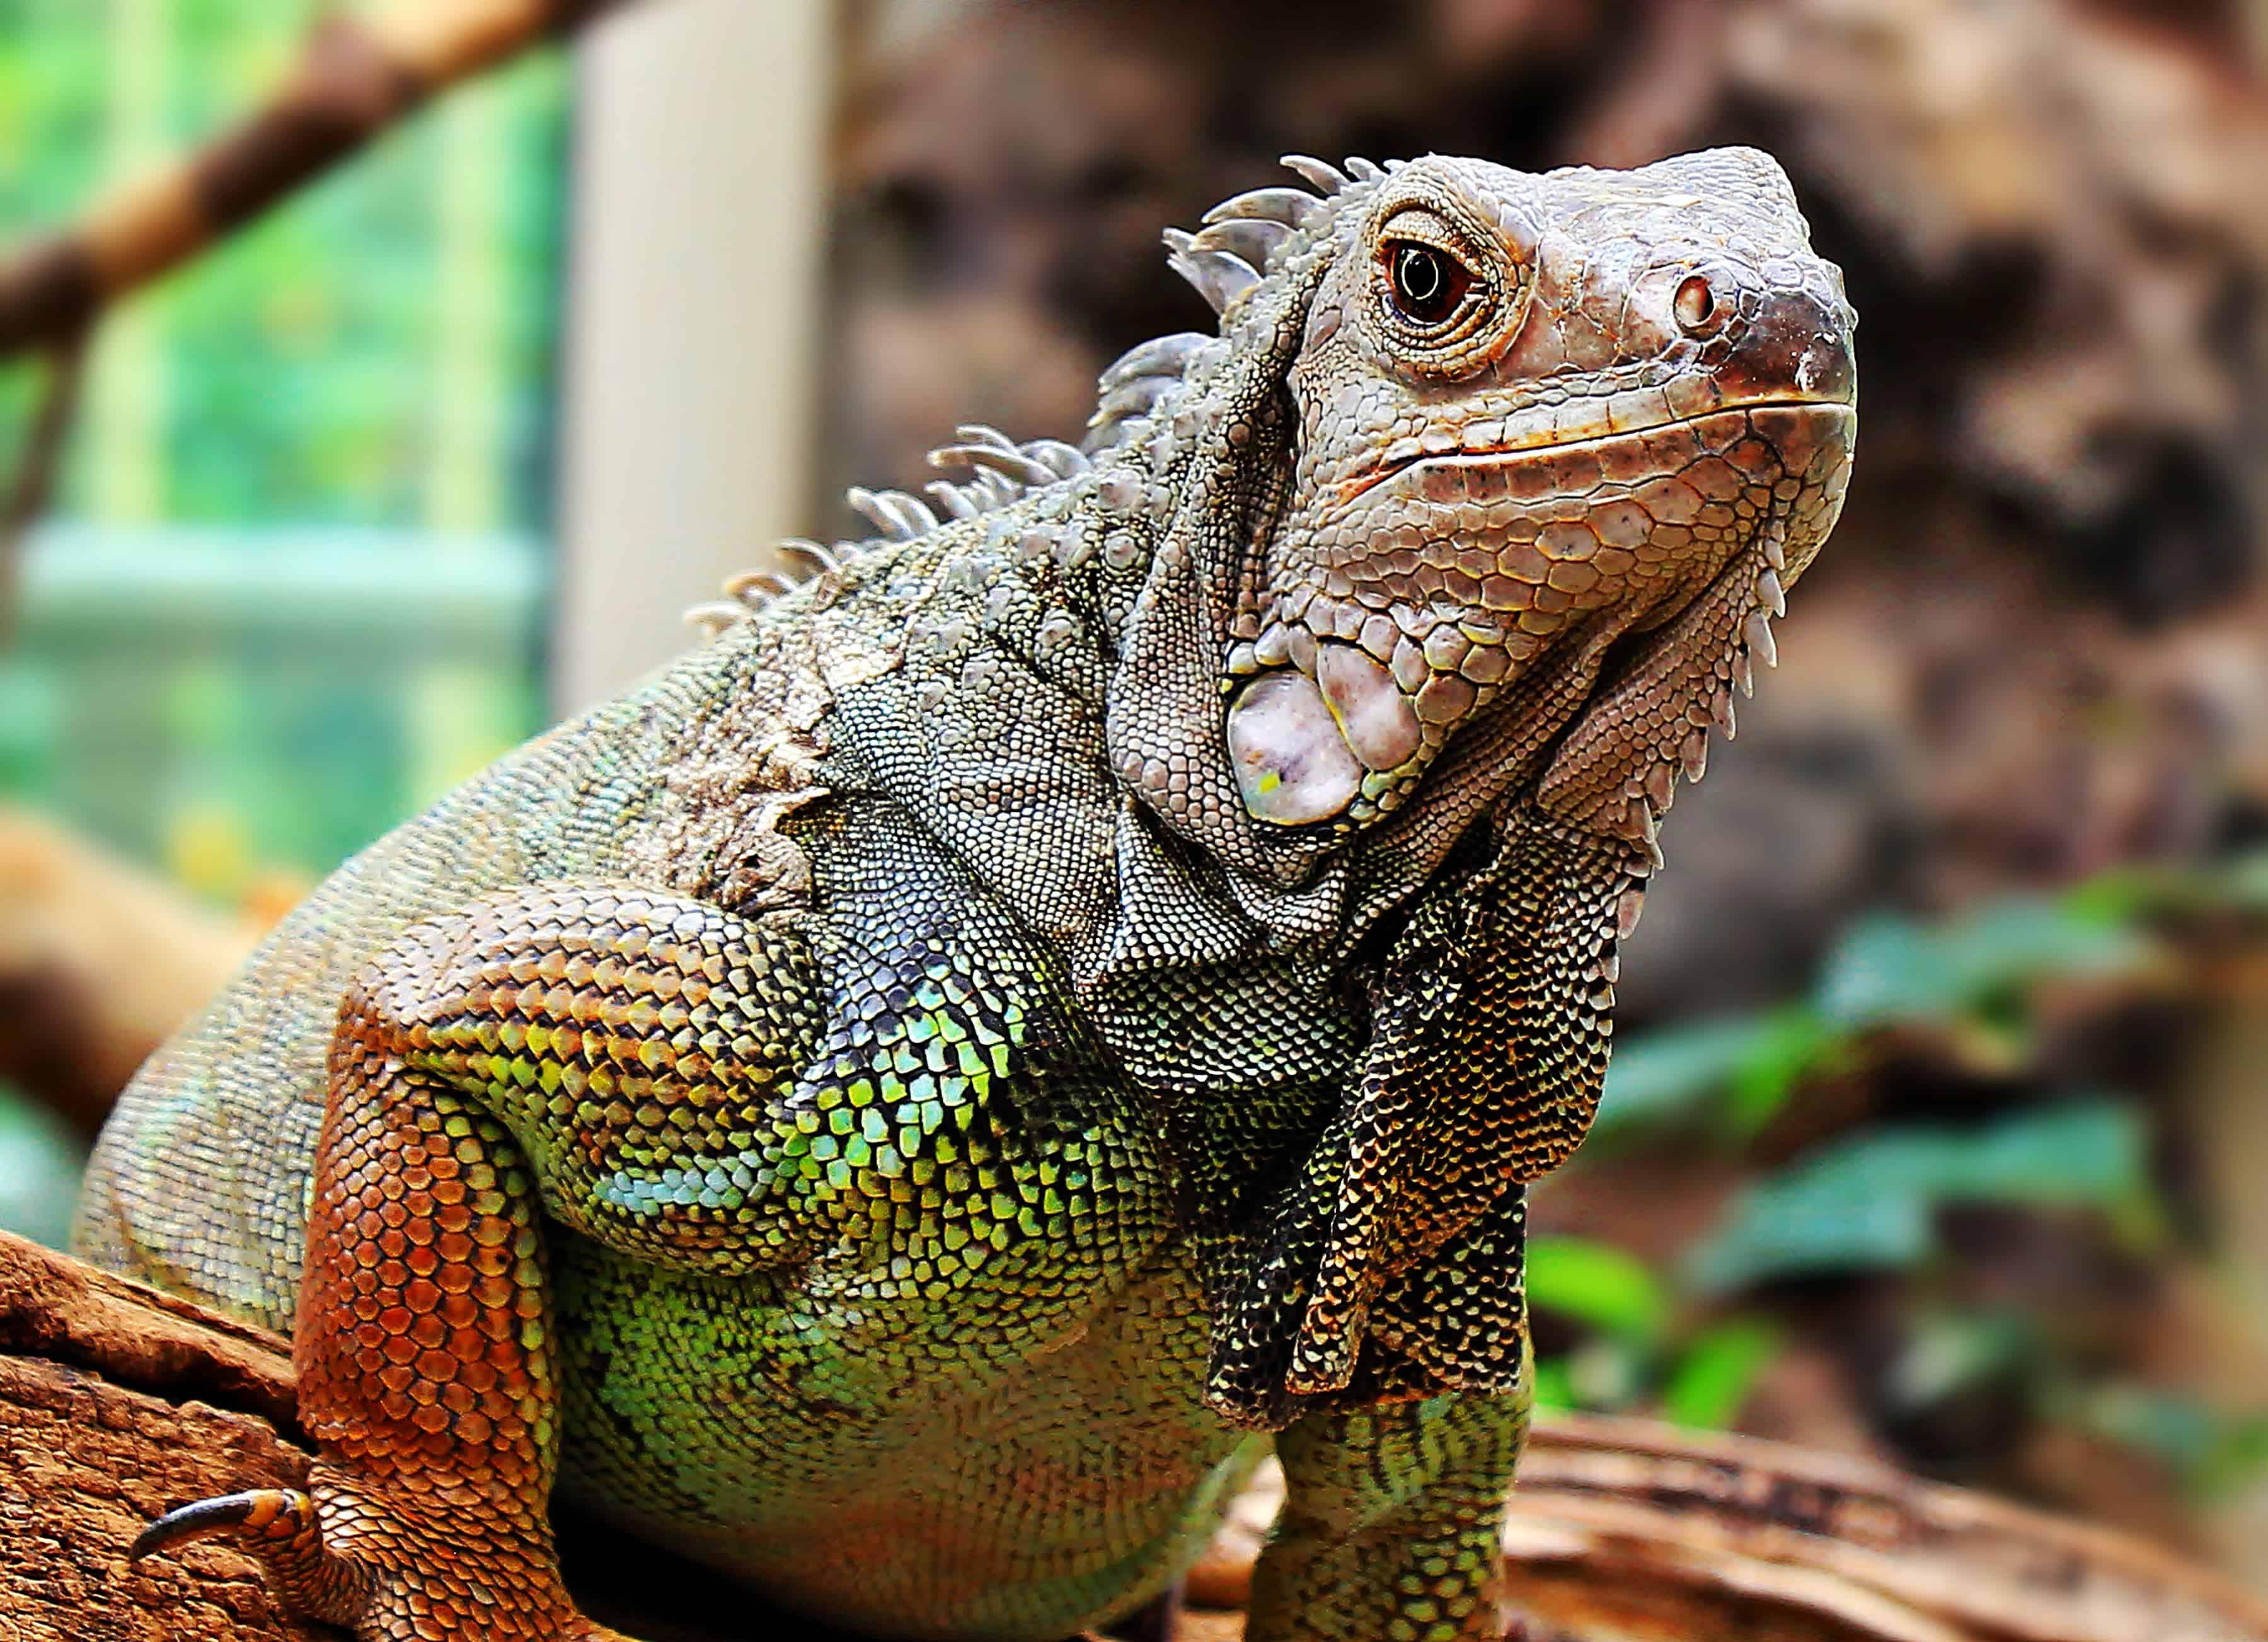 Free picture: animal, lizard, reptile, wildlife, iguana ...